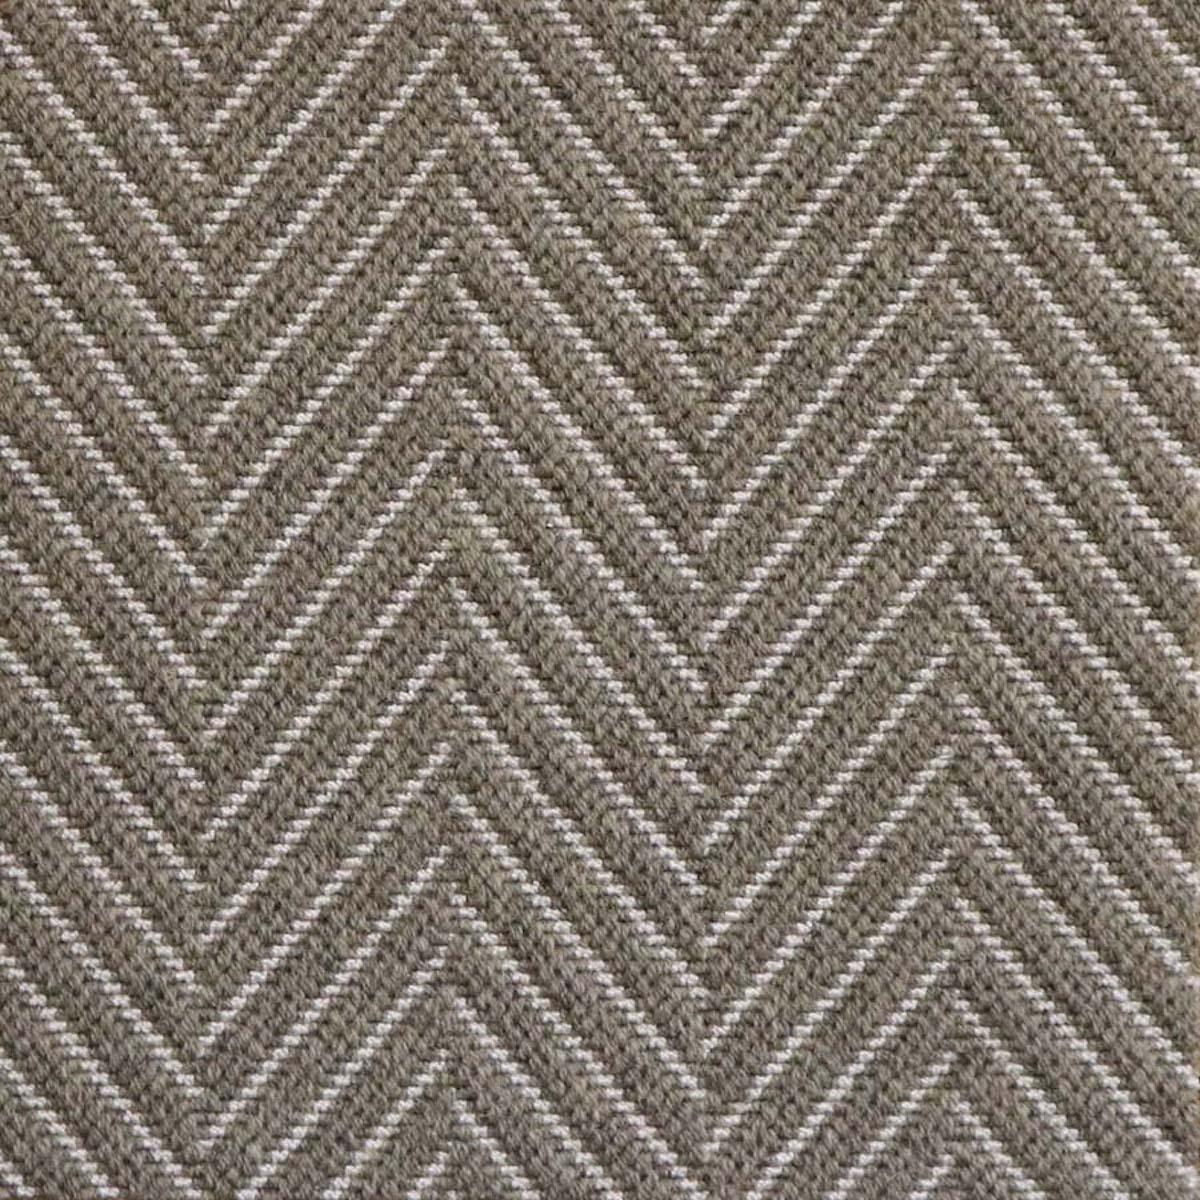 hanbury_wool-nylon_broadloom_patterson-flynn-martin_pfm